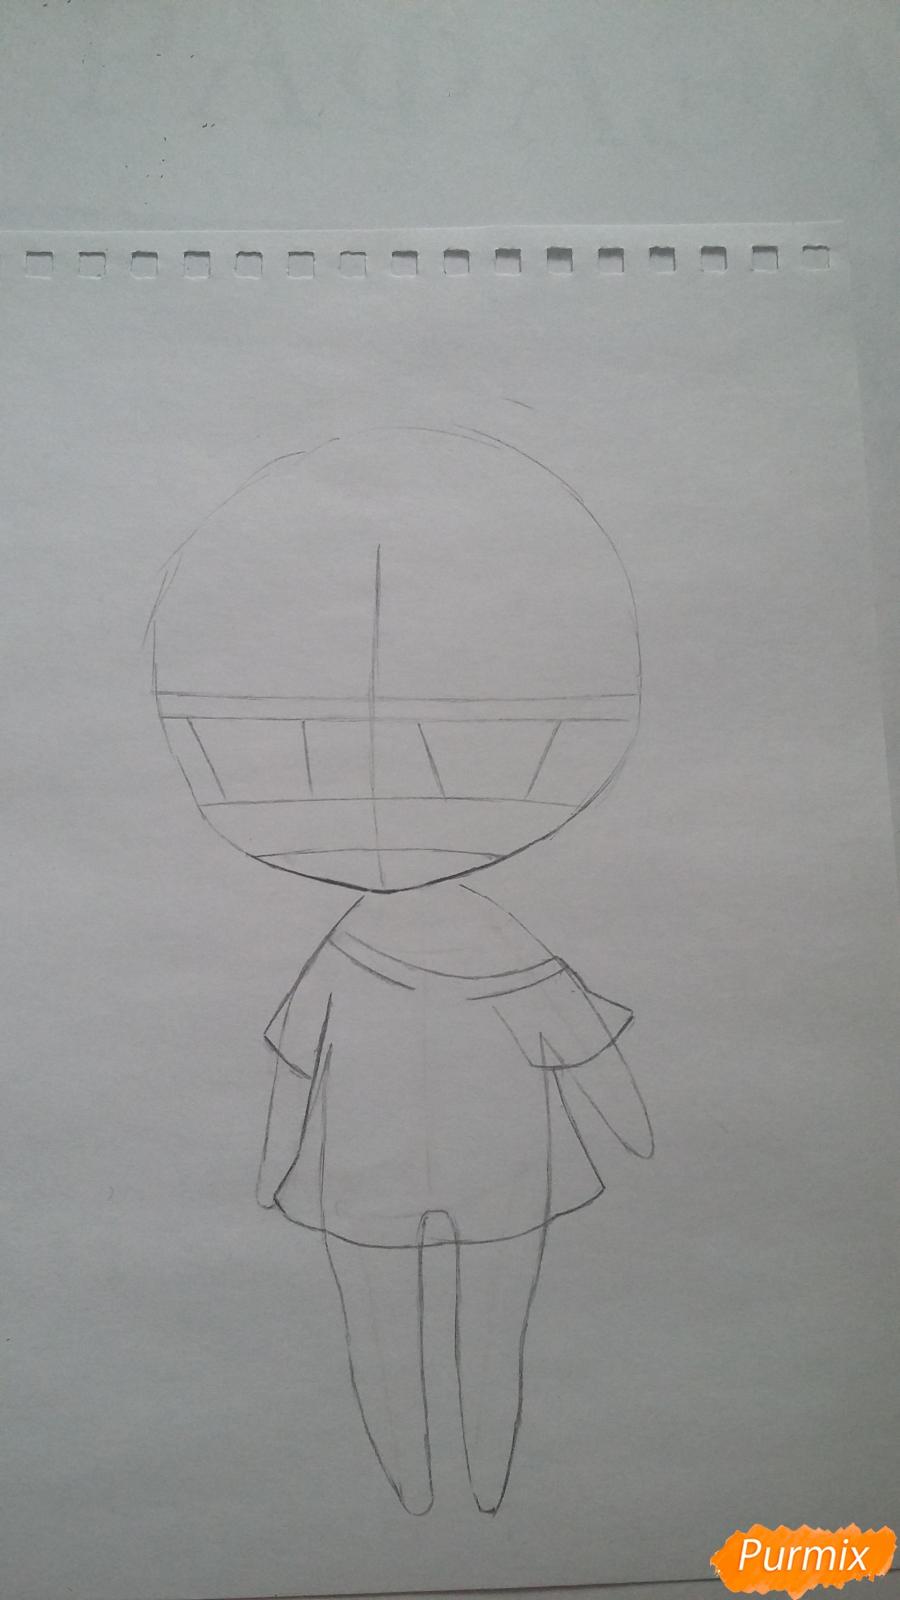 Рисуем милую чиби-тян в пижаме и игрушкой в руке карандашами - шаг 4